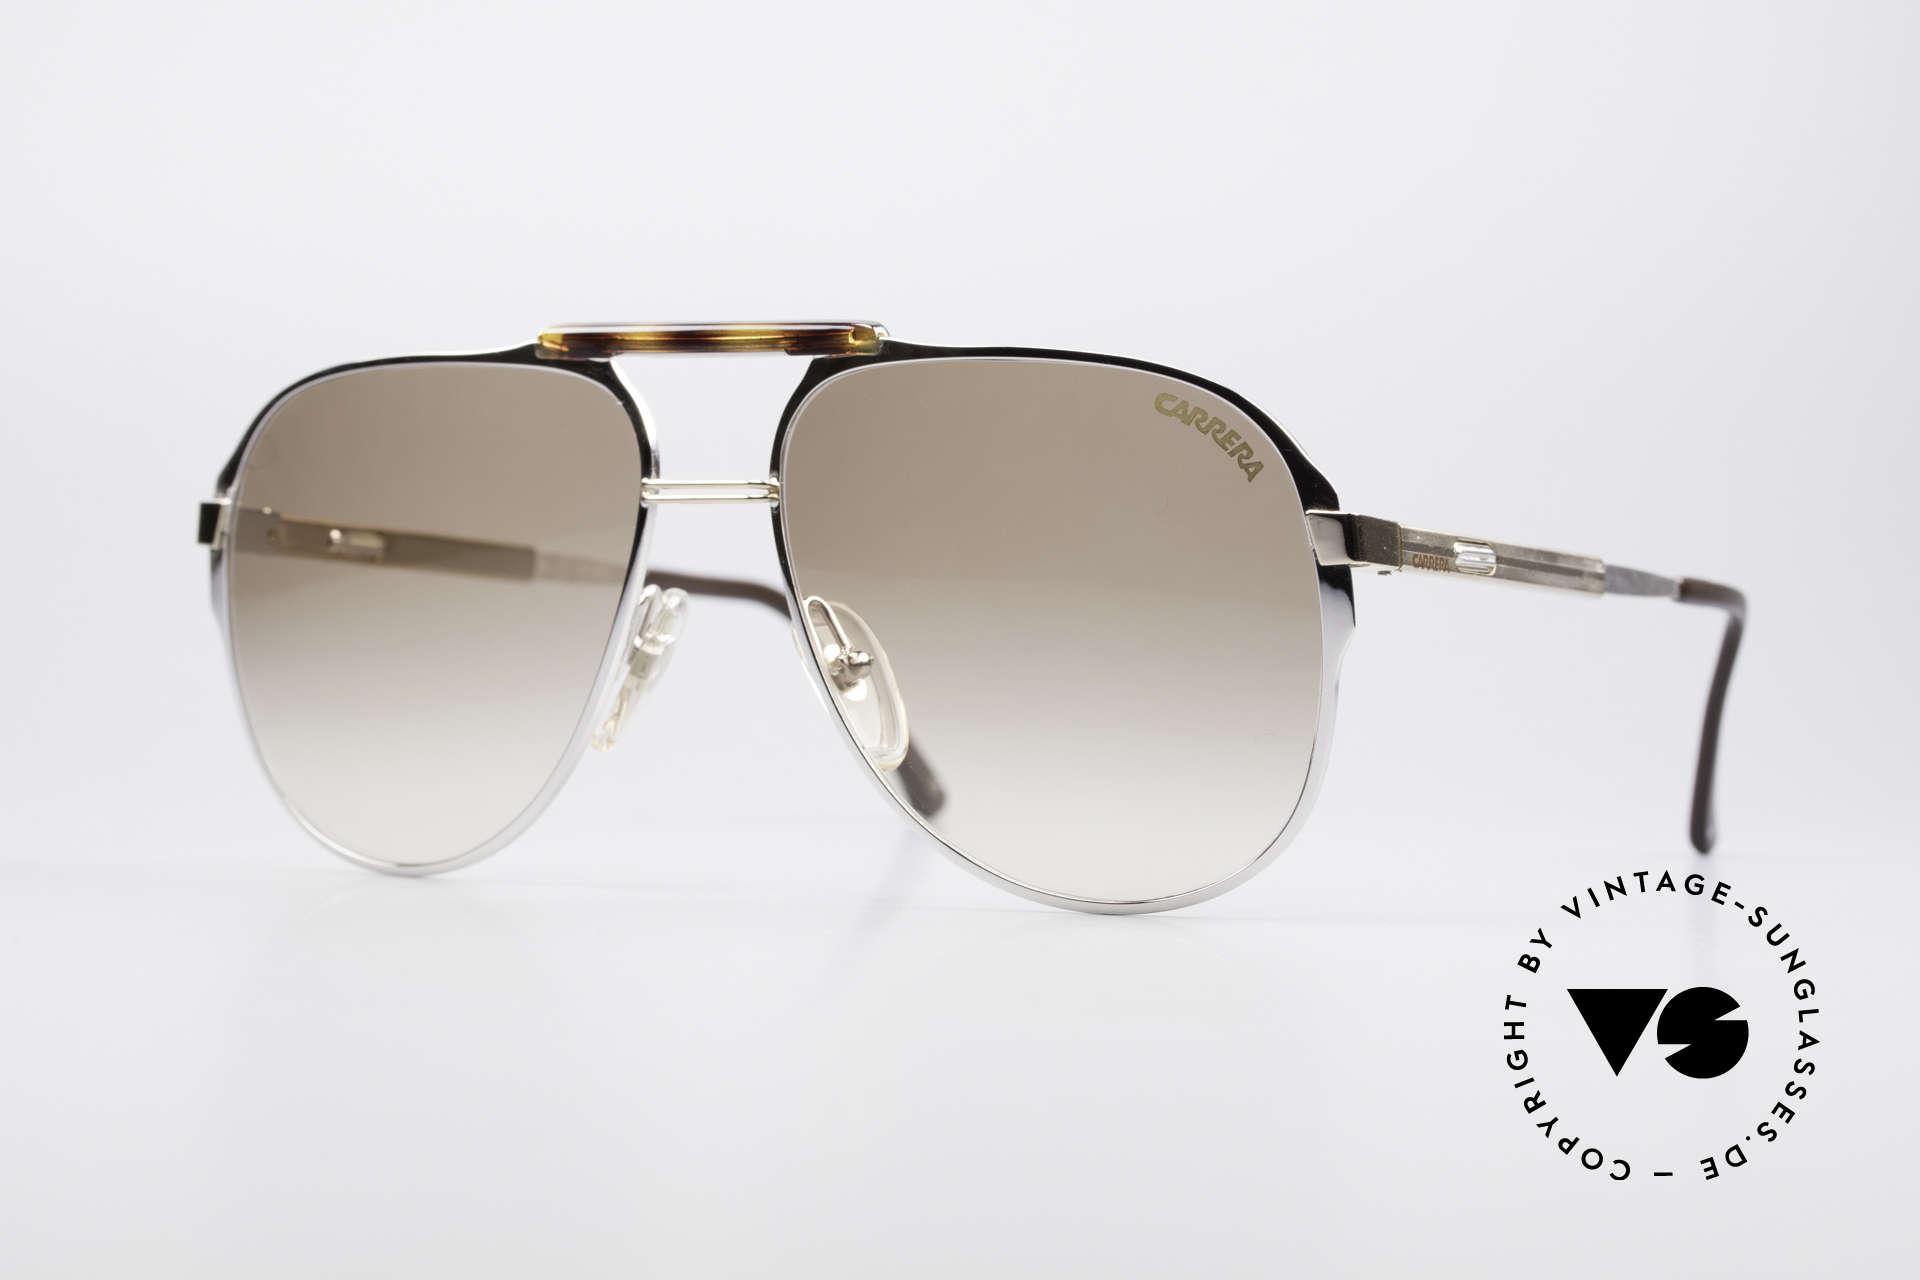 Carrera 5320 Adjustable Temples 80's Vario, brilliant 1980's aviator sunglasses by CARRERA, Made for Men